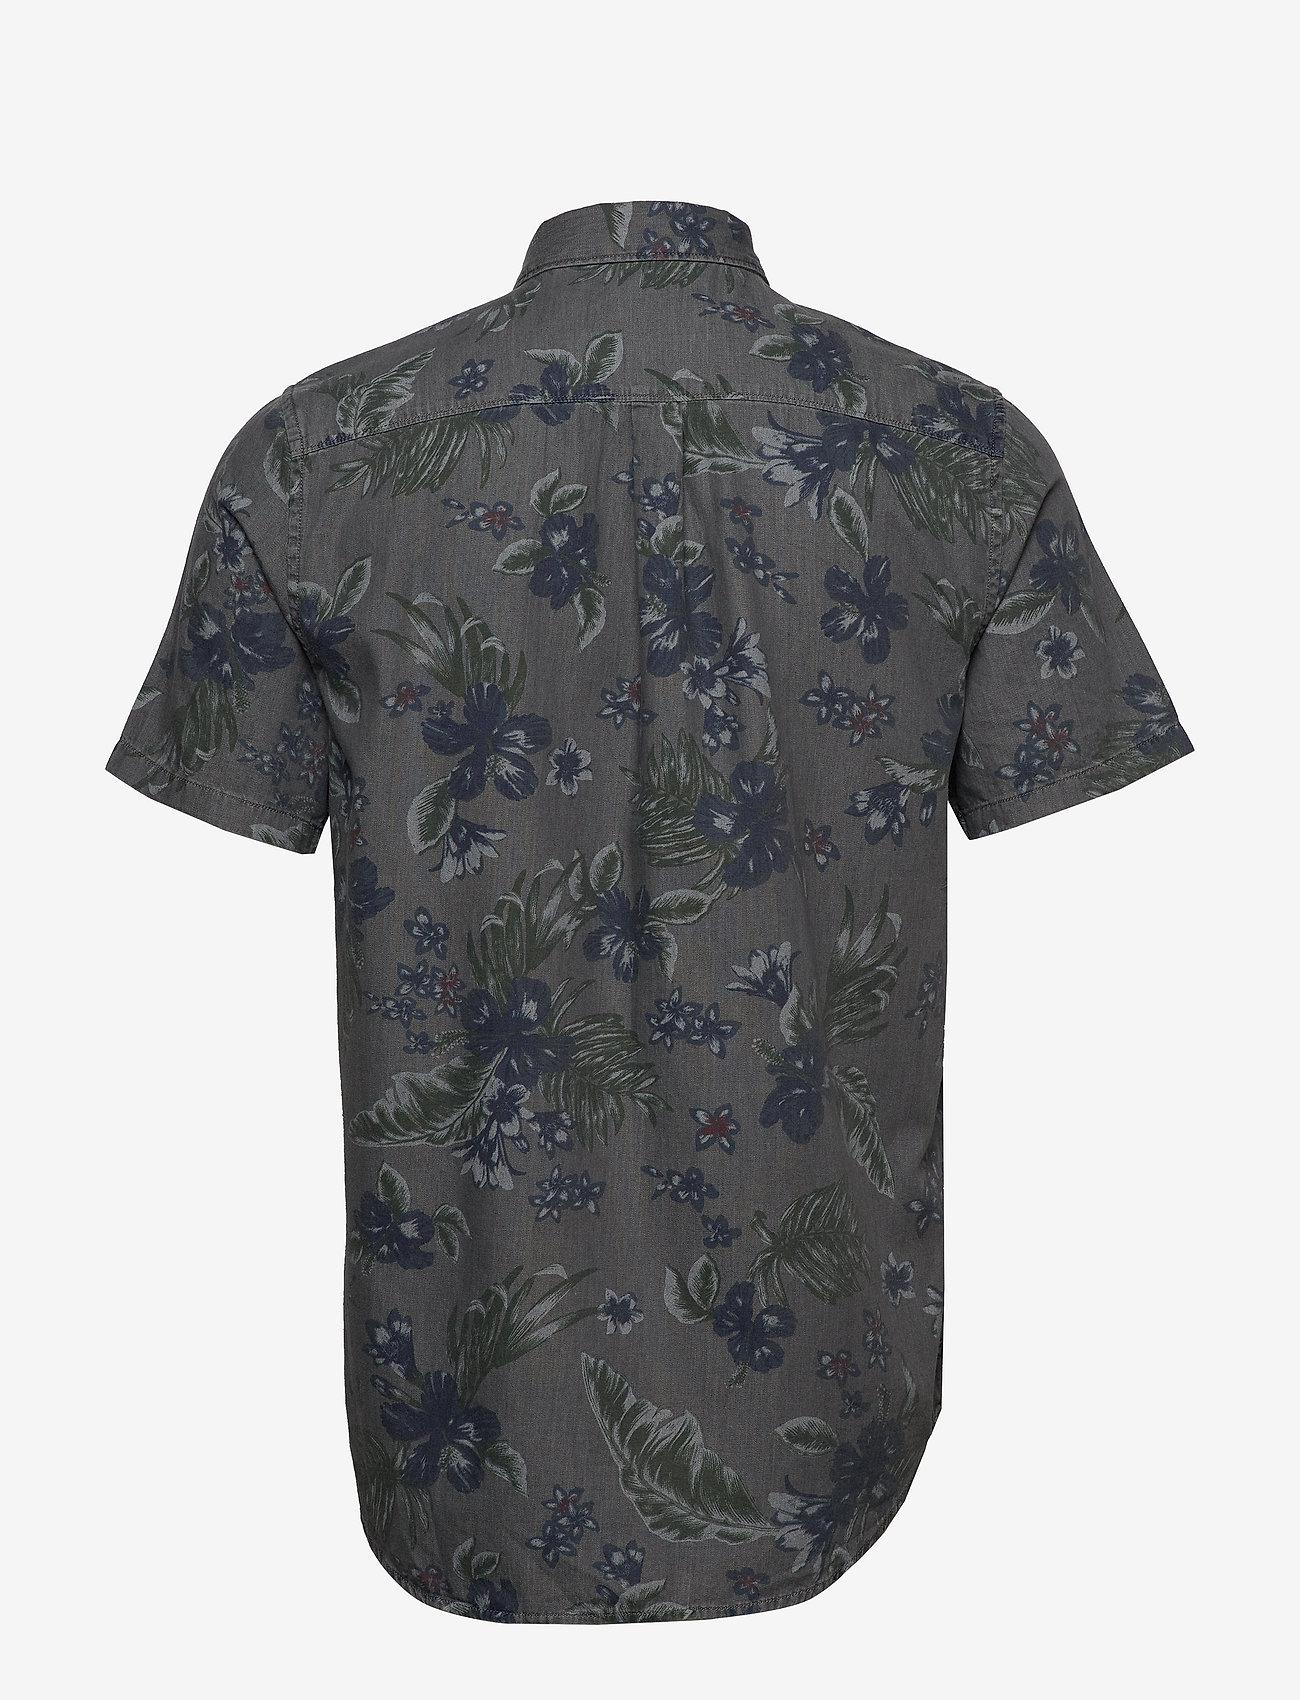 Miami Loom Ss Shirt (Vintage Hawaiian Grey) - Superdry pDqTCH